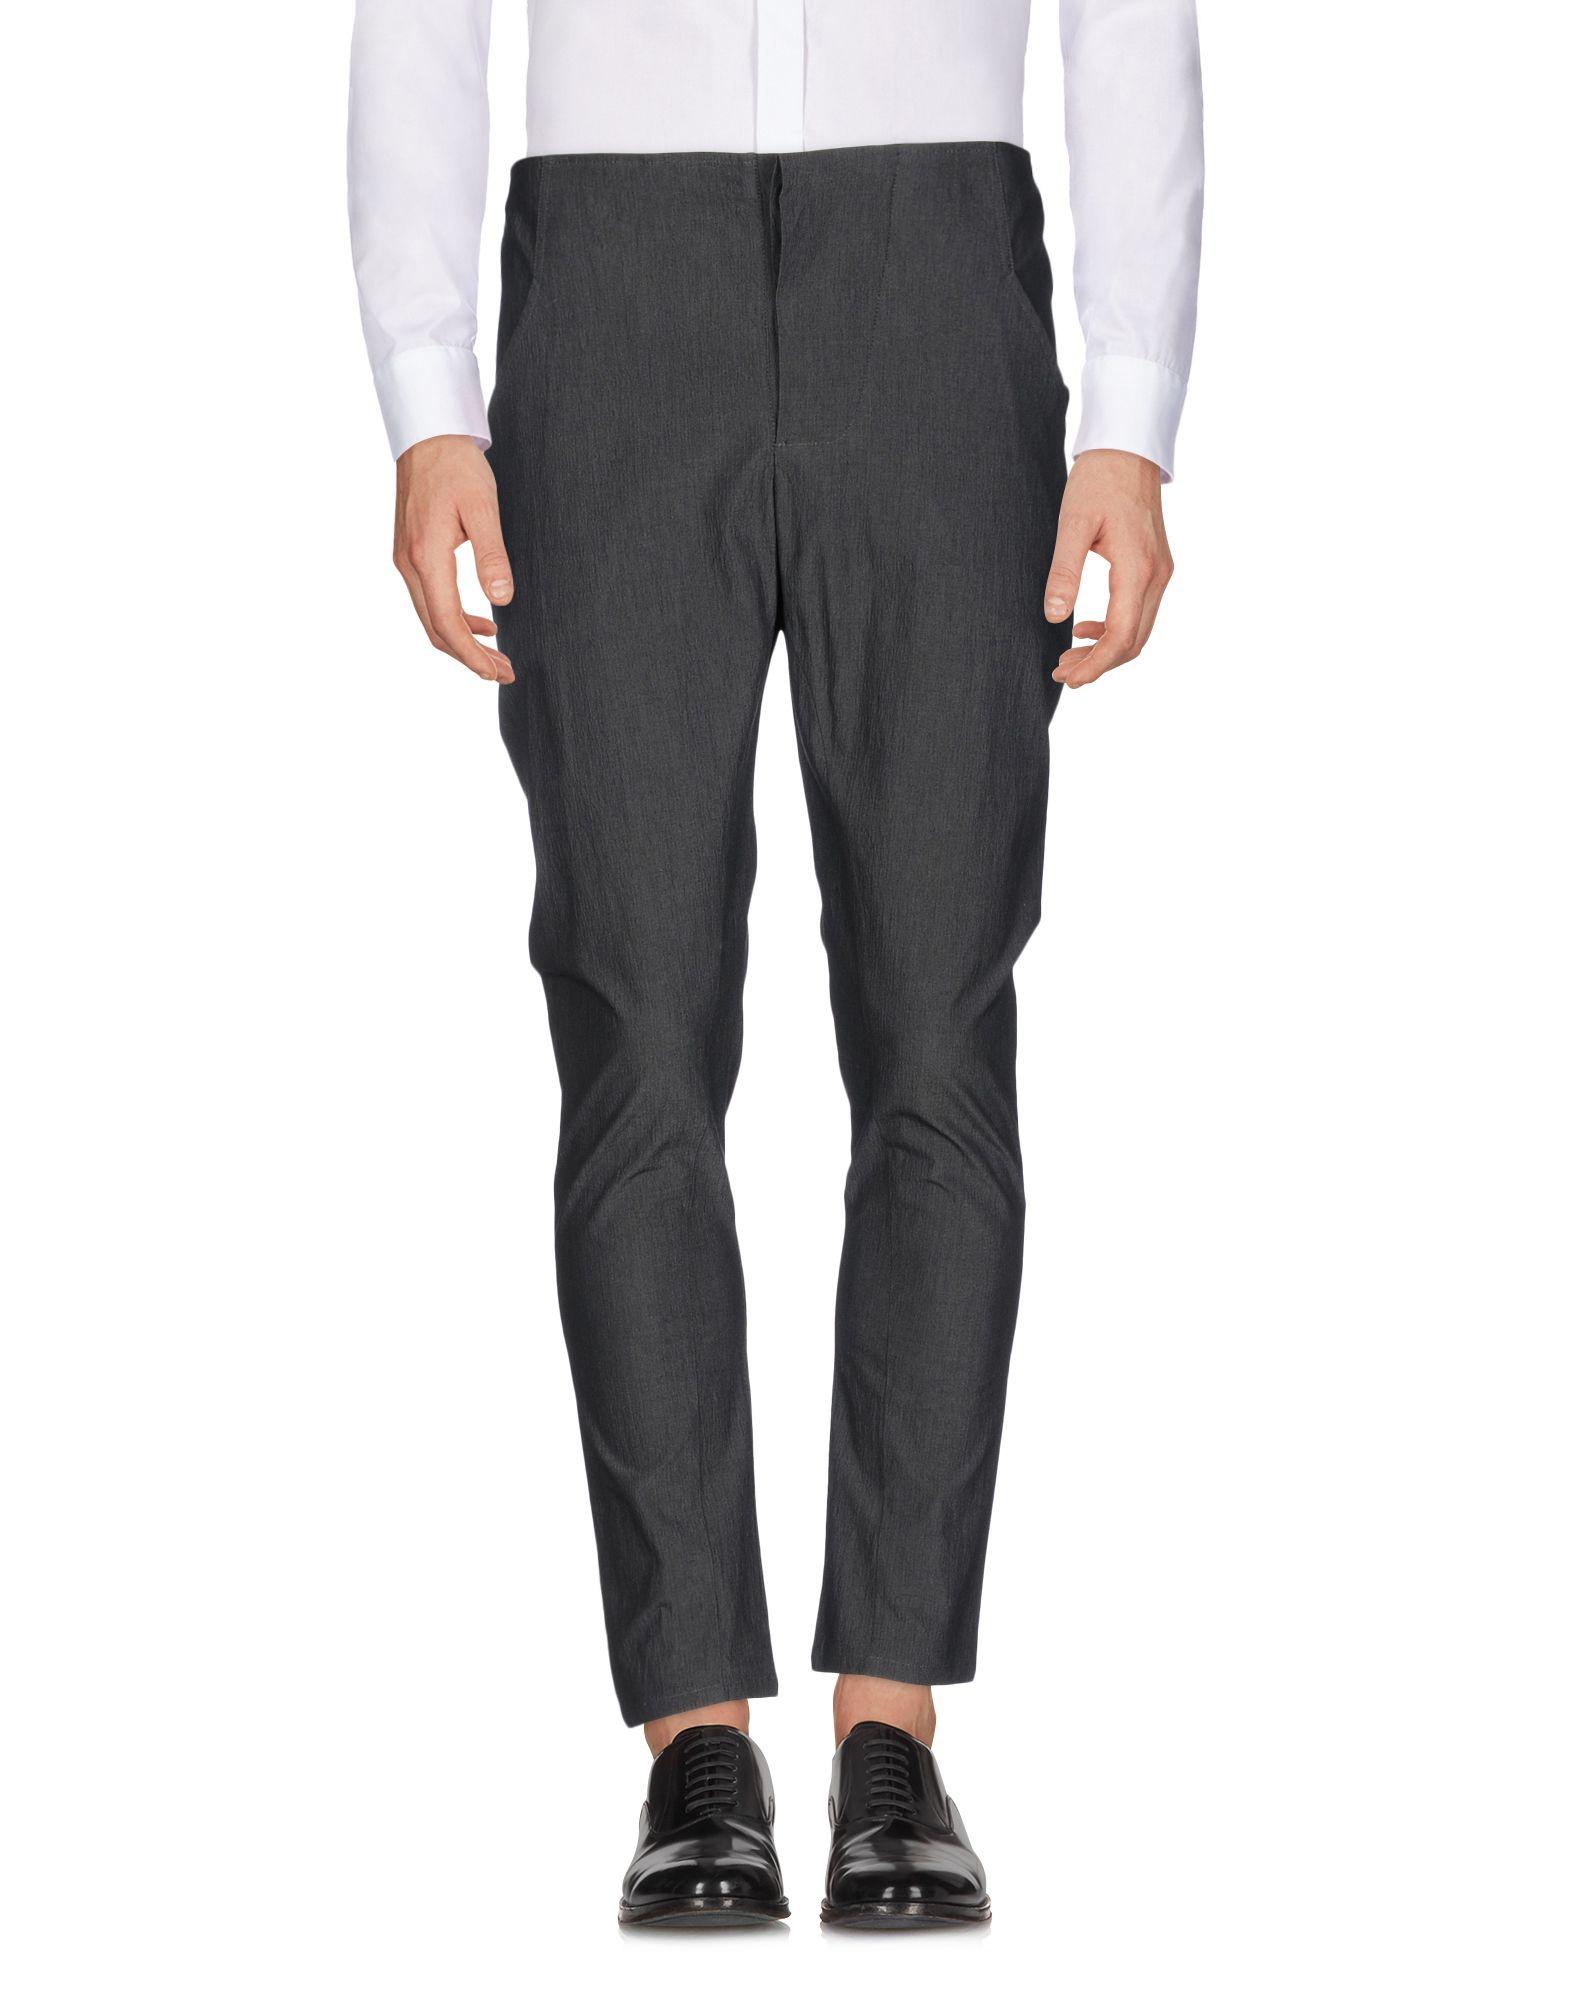 Pantalone Manostorti Uomo - Acquista online su